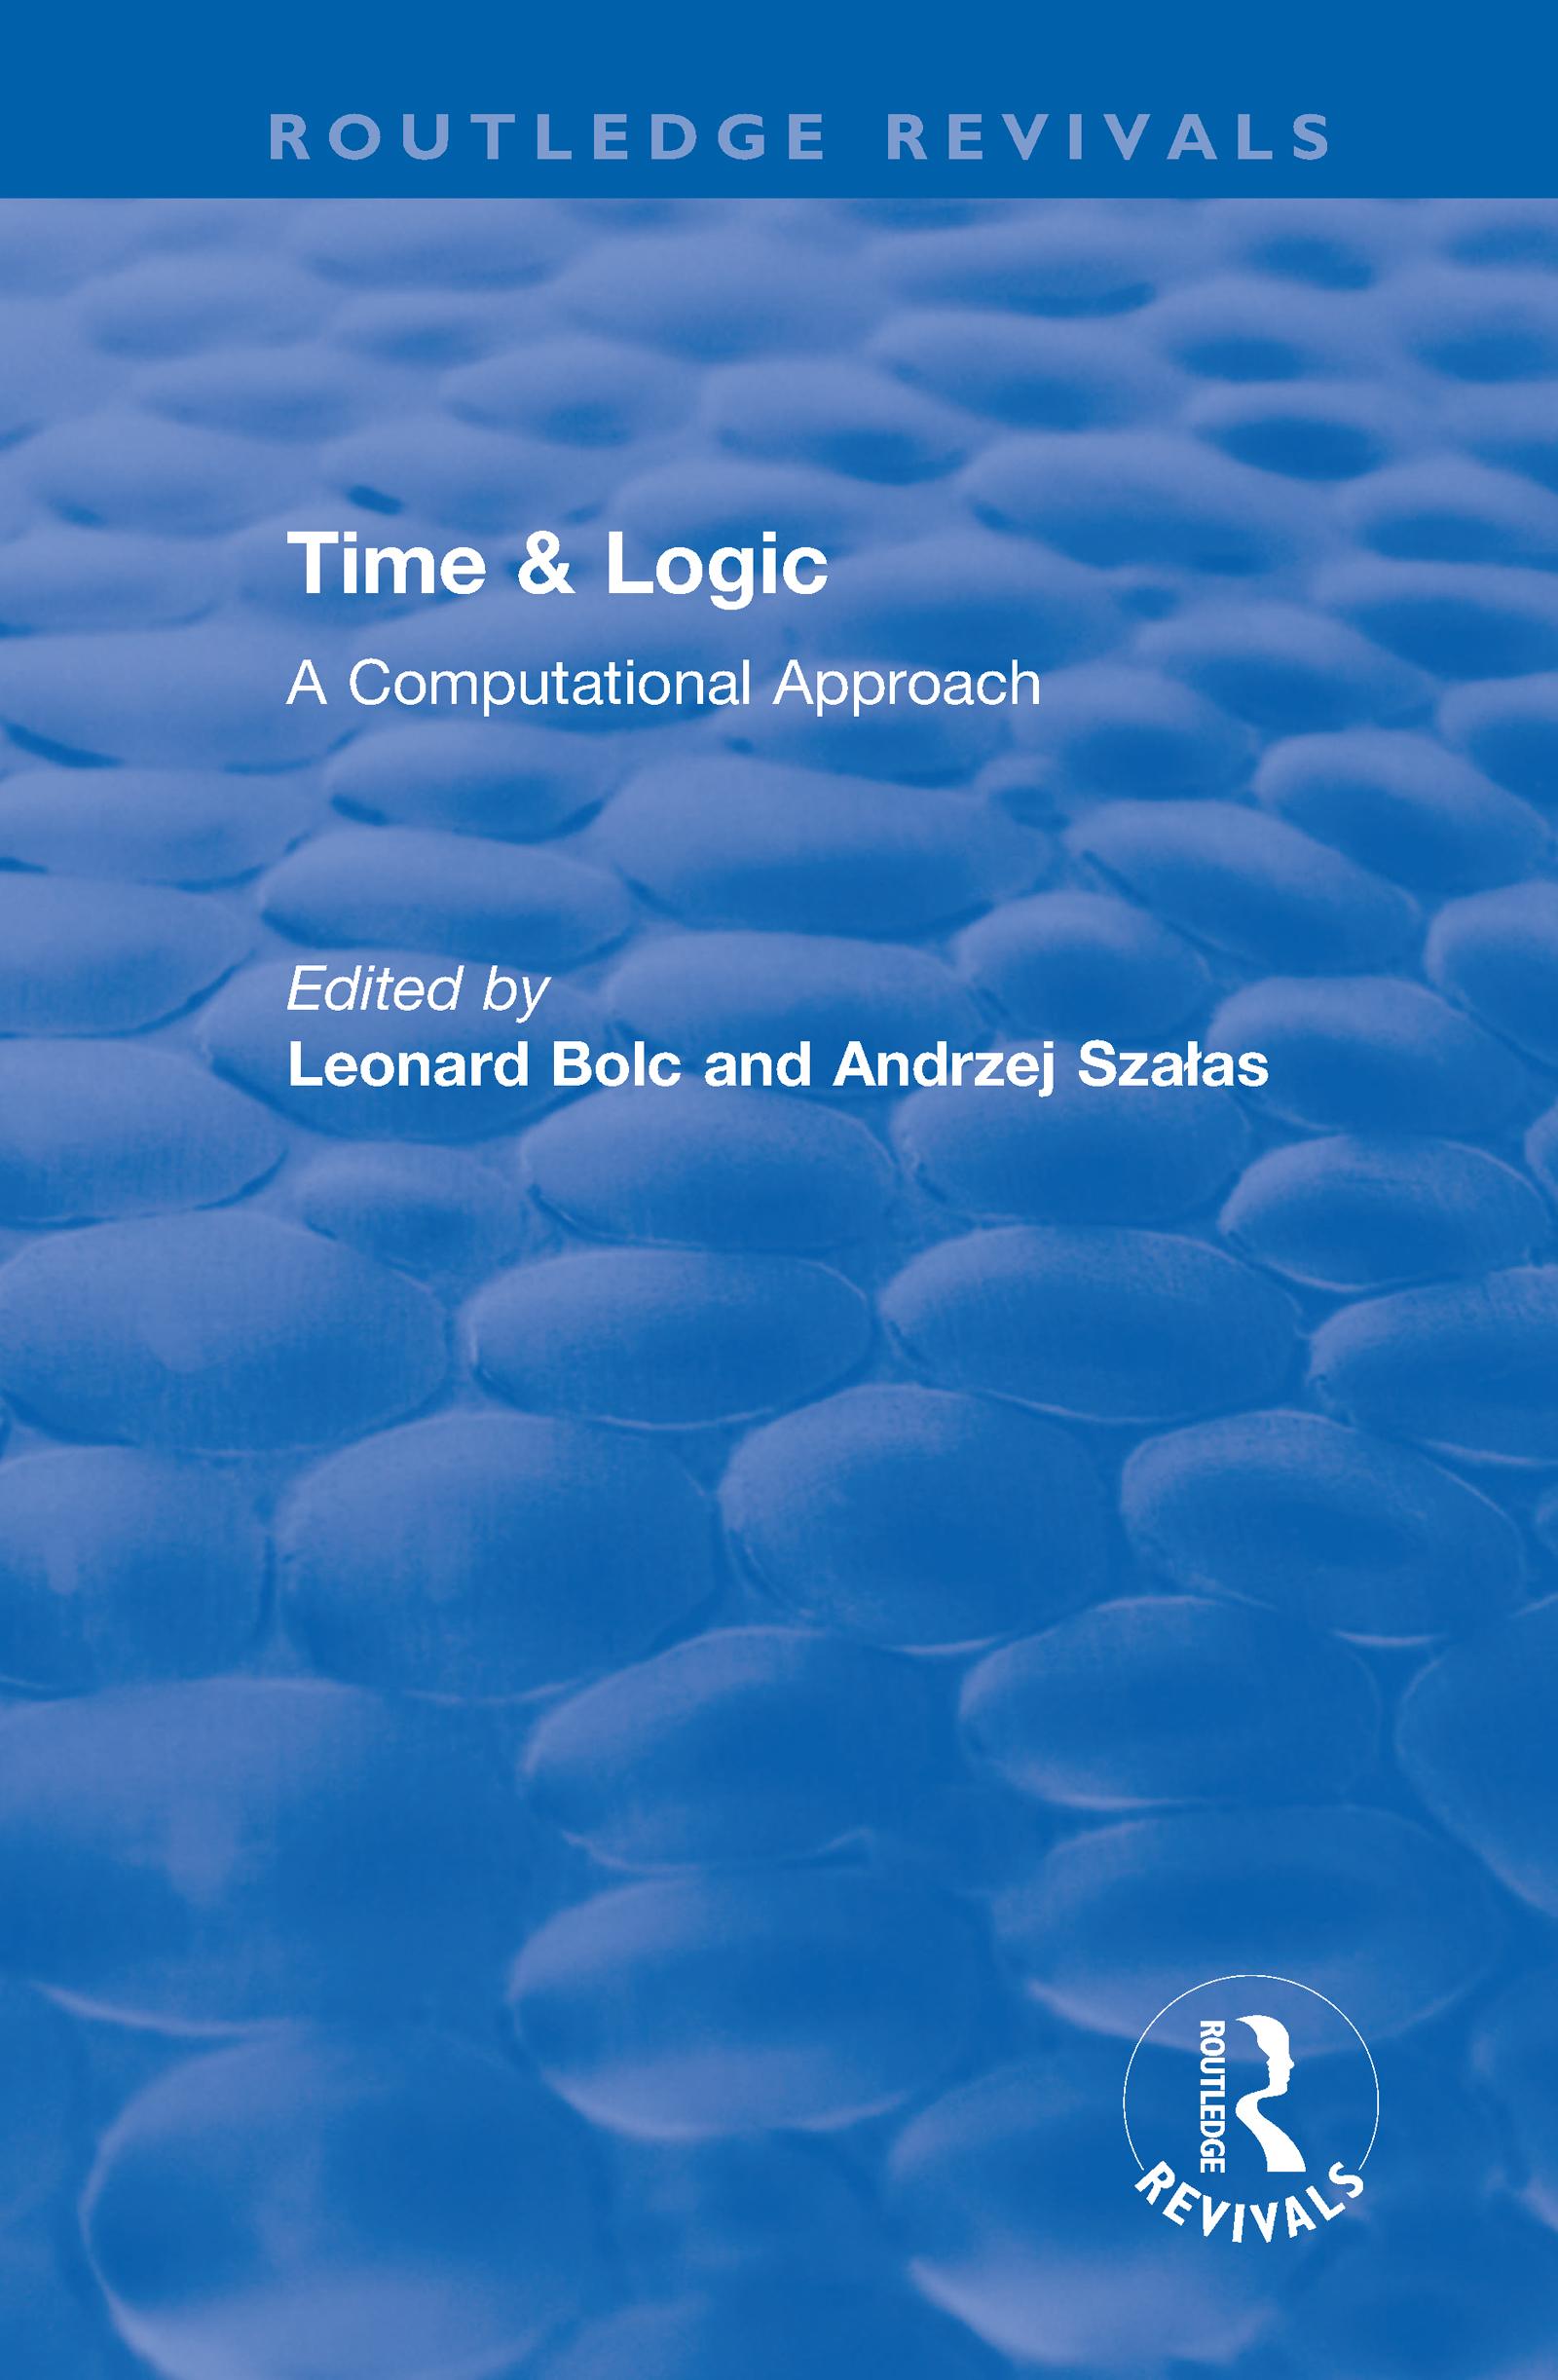 Time & Logic